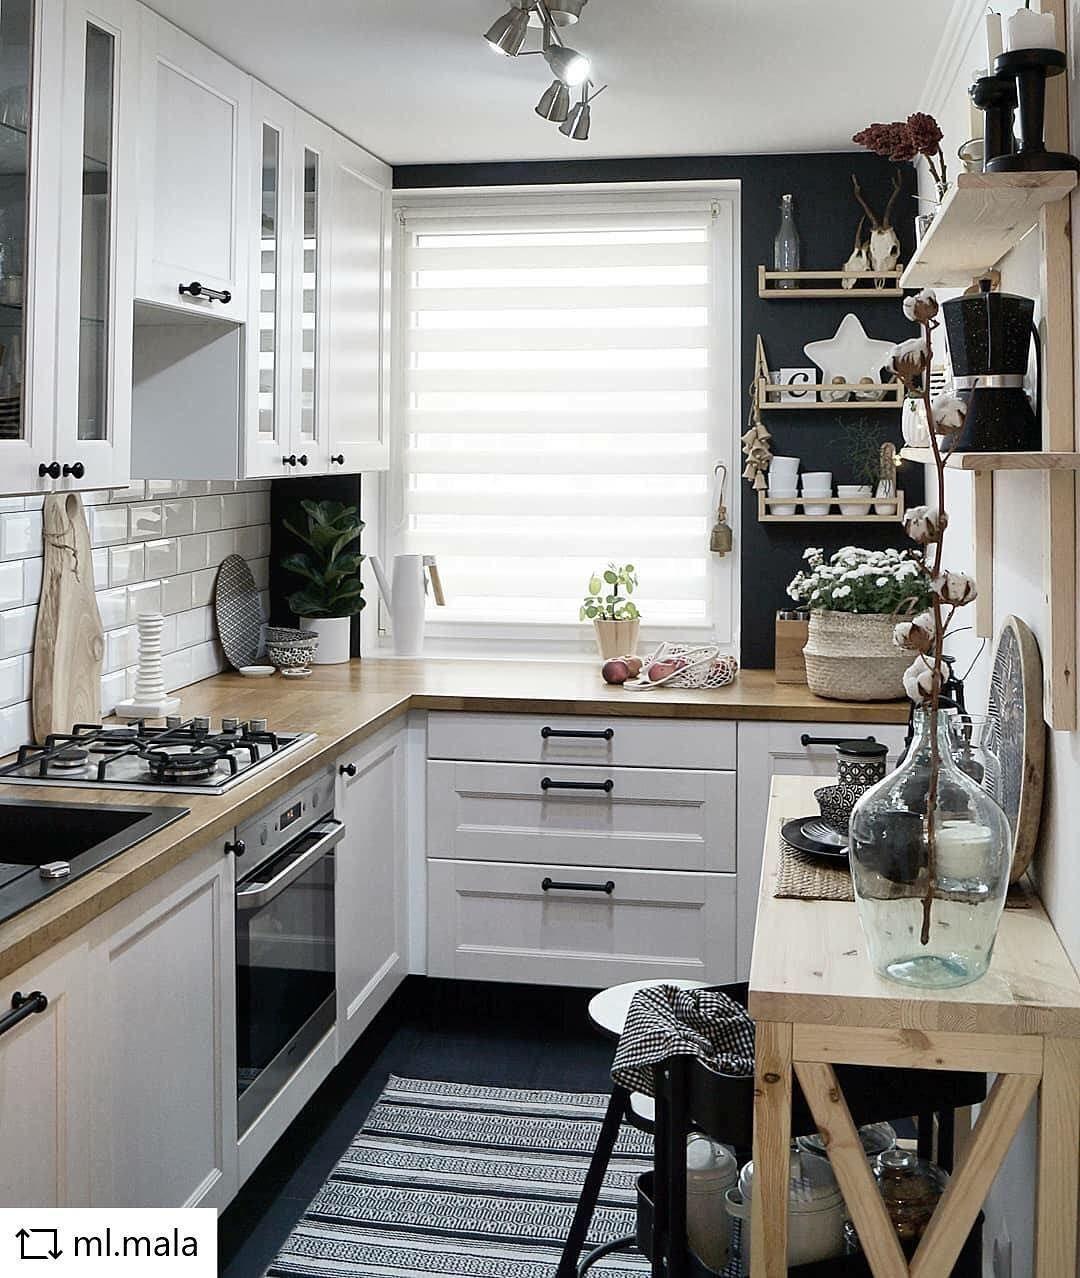 Ma  kuchnia ale jaka funkcjonalna czarne ciany  ciemna pod oga  doskona ym  em dla also best small kitchen ideas images in home kitchens rh pinterest